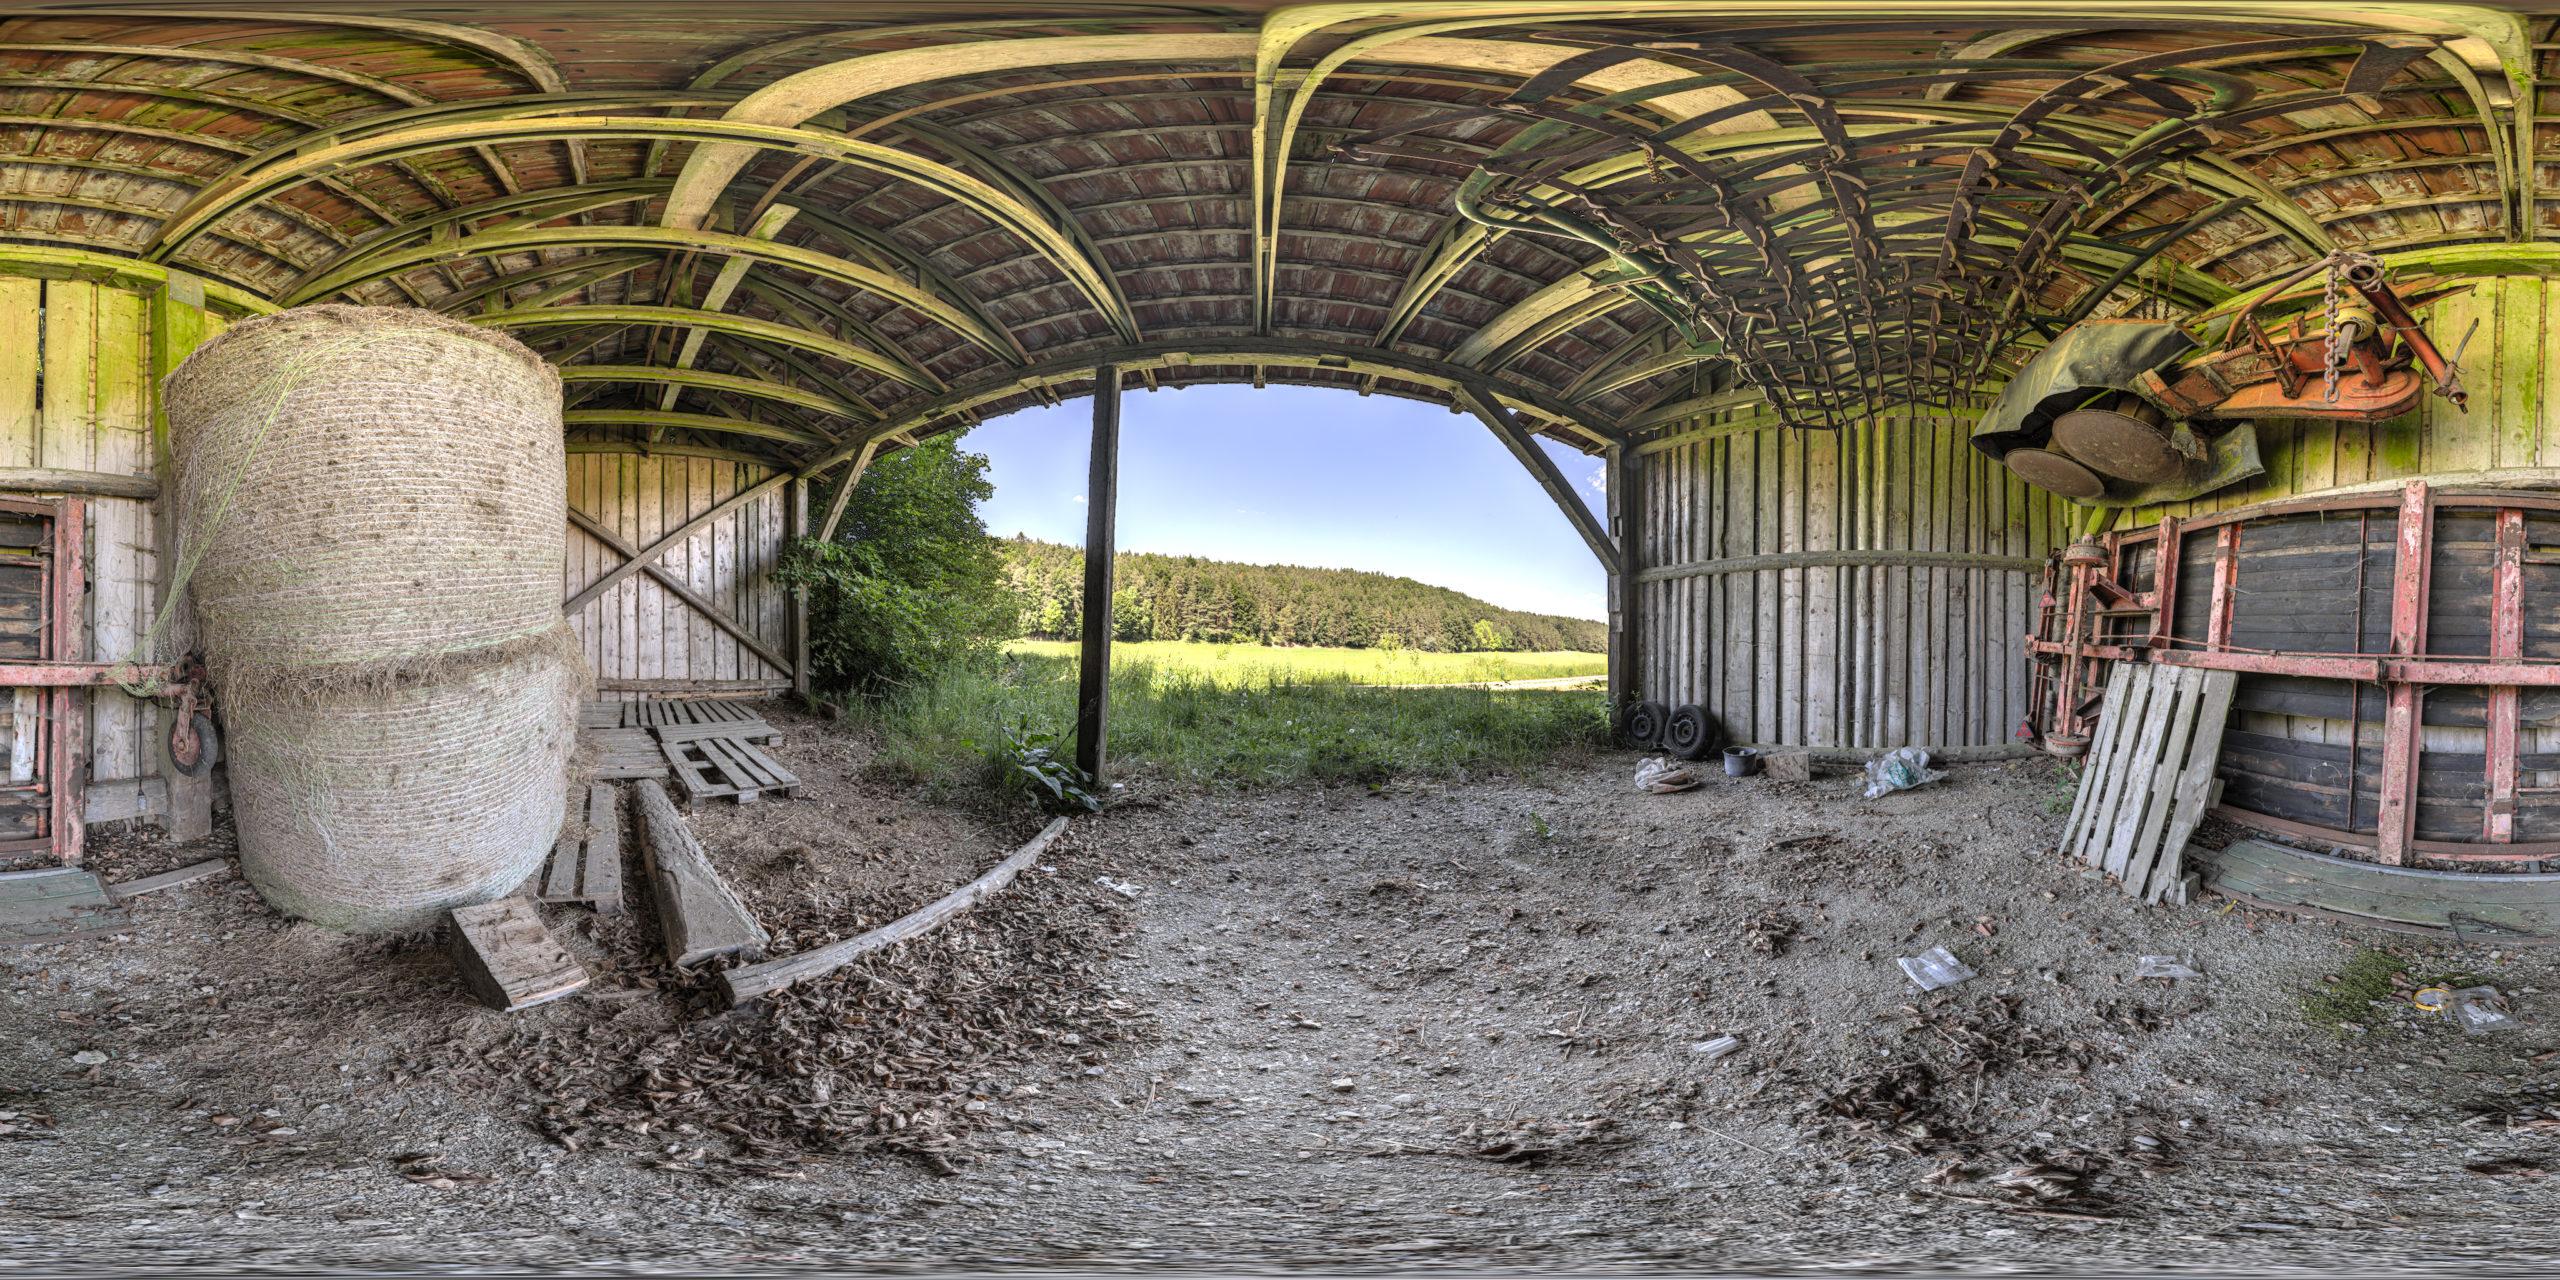 HDRI-Skies-Old-Barn-Strüthof